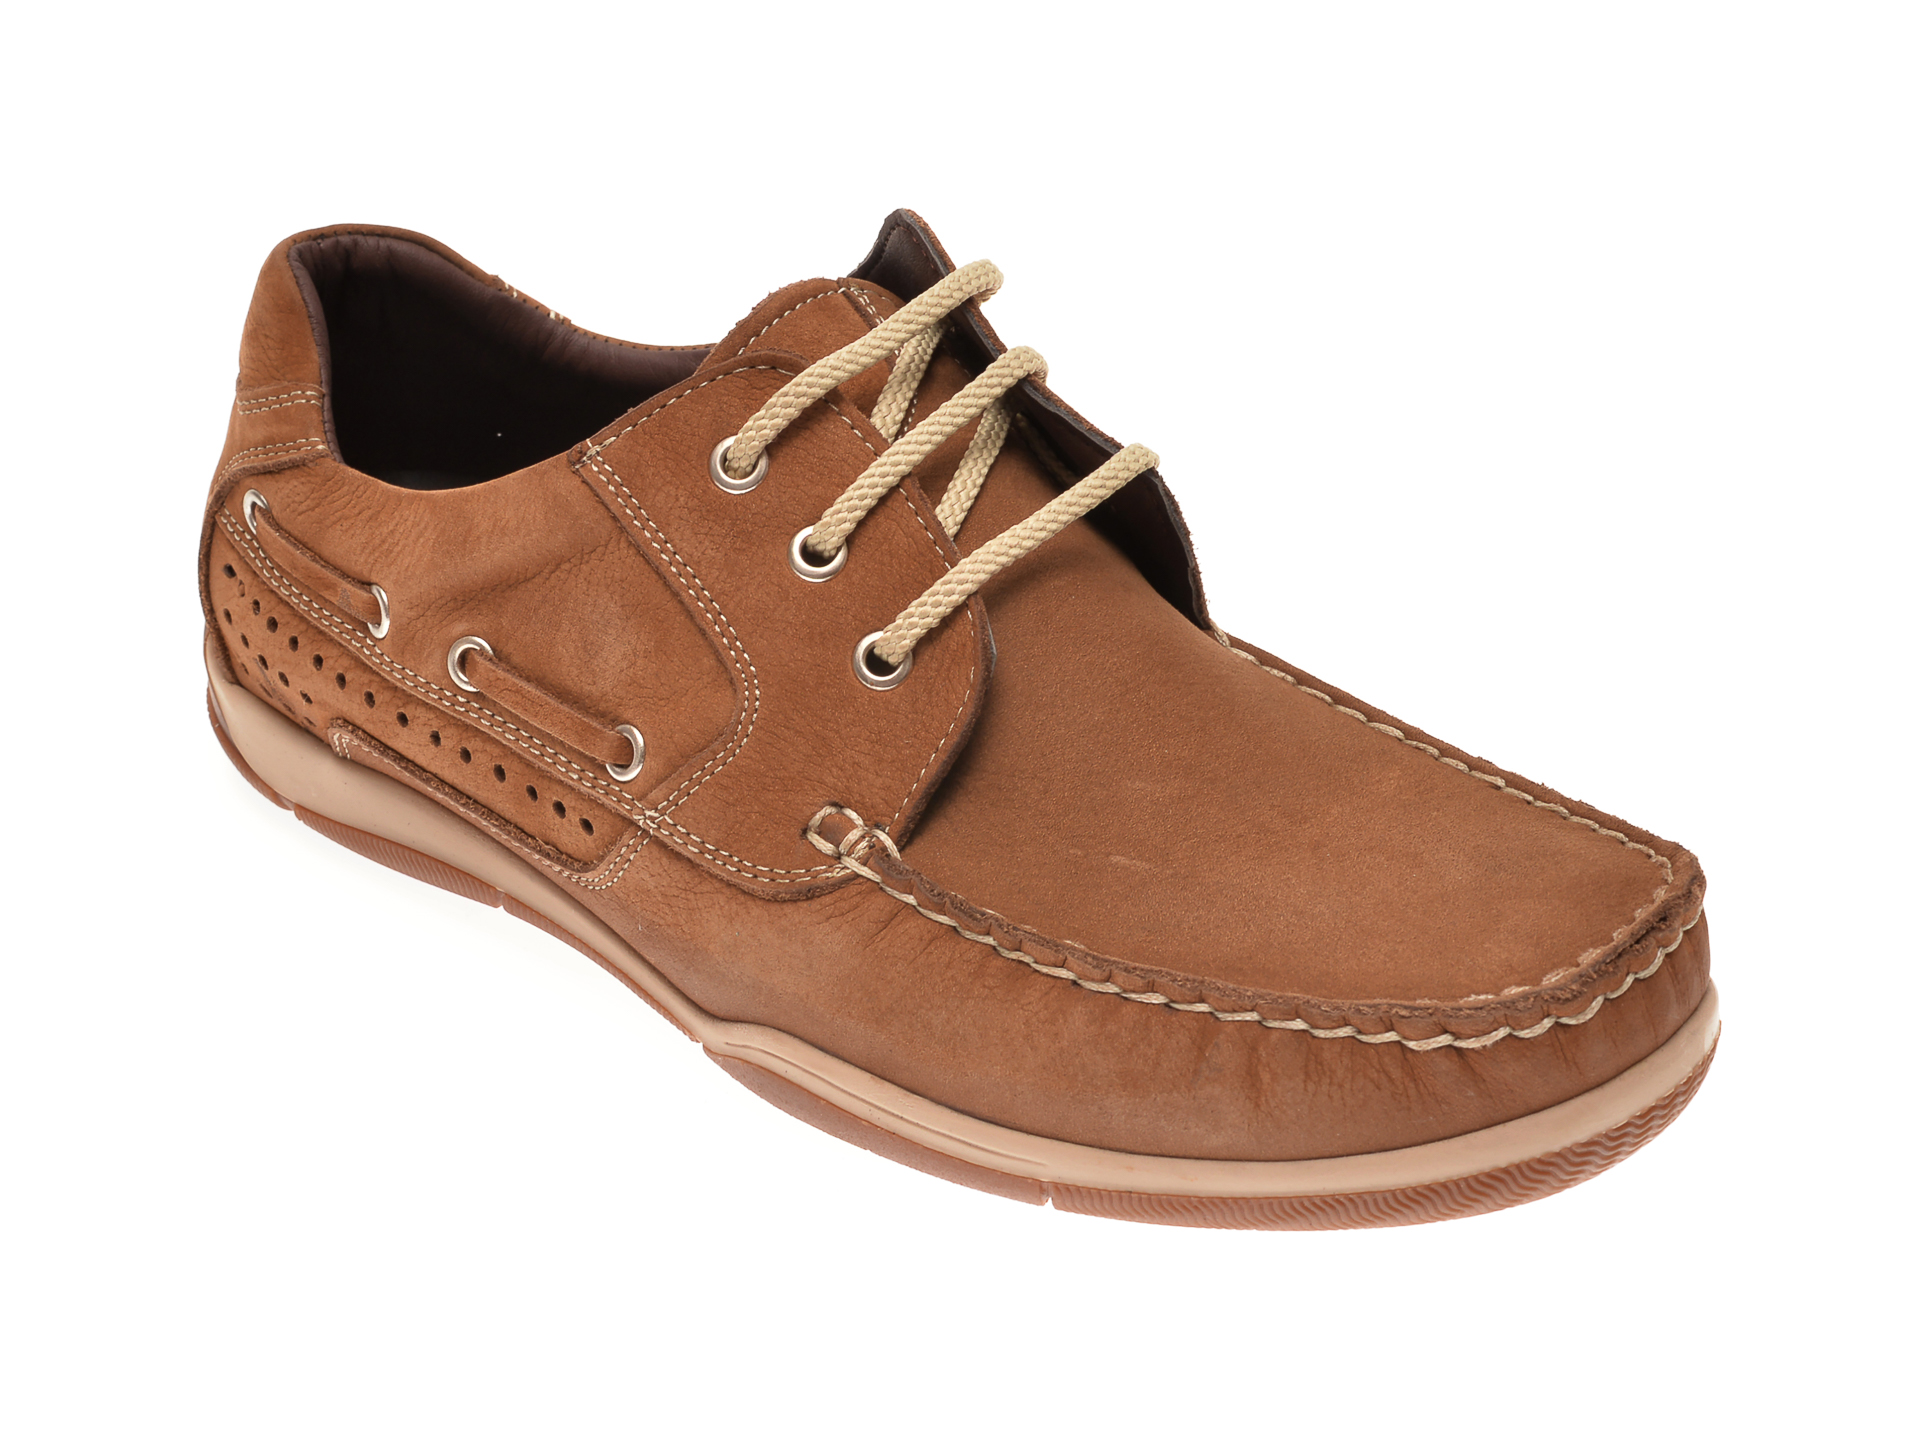 Pantofi OTTER maro, 111532, din piele intoarsa imagine